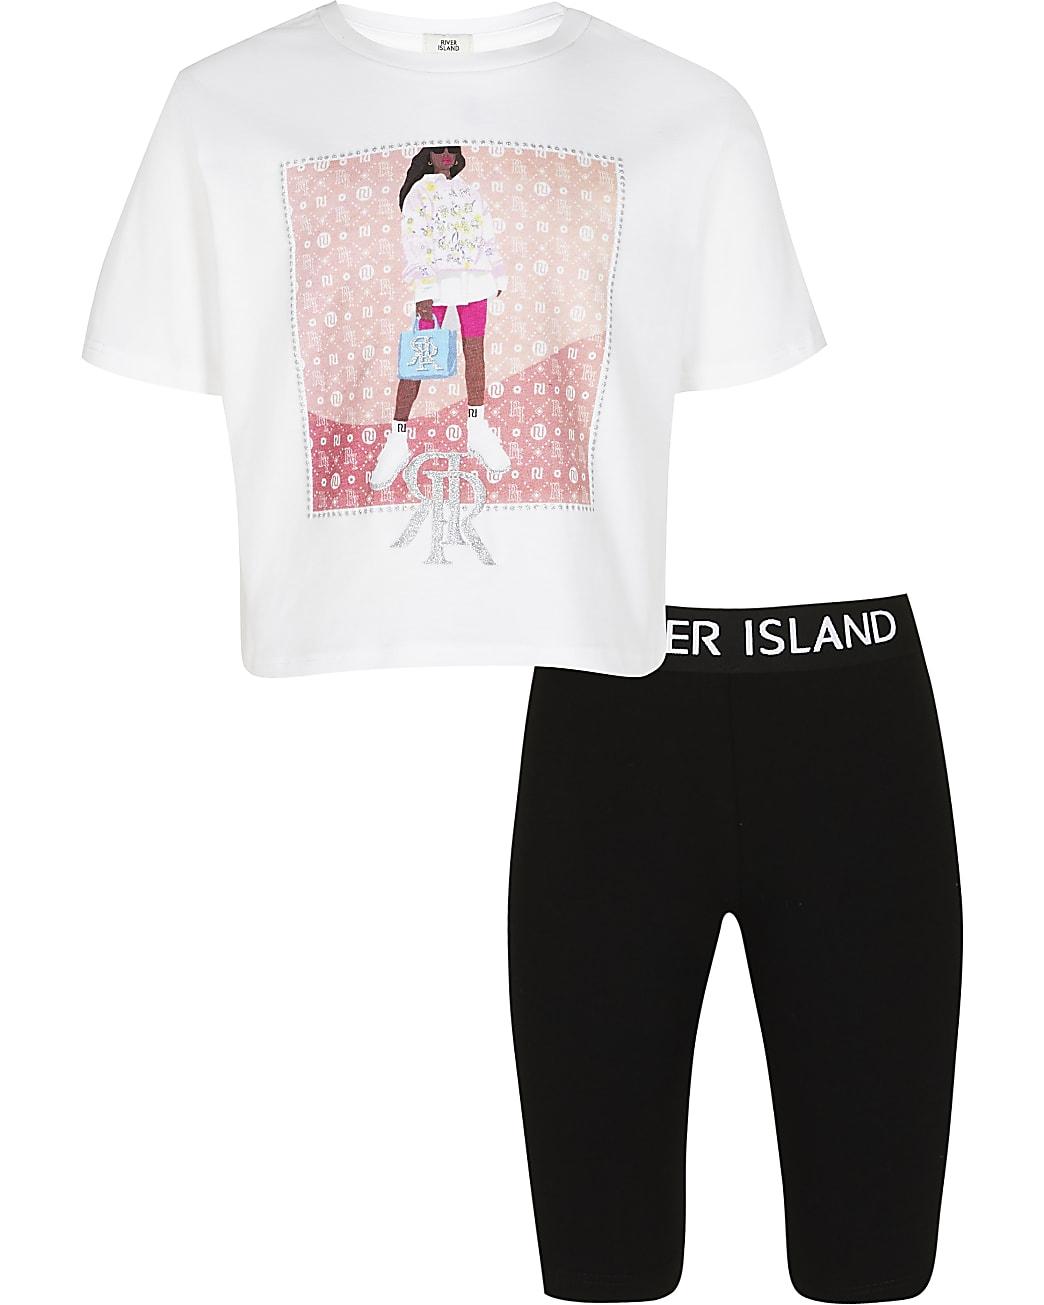 Girls white RIR graphic t-shirt and leggings